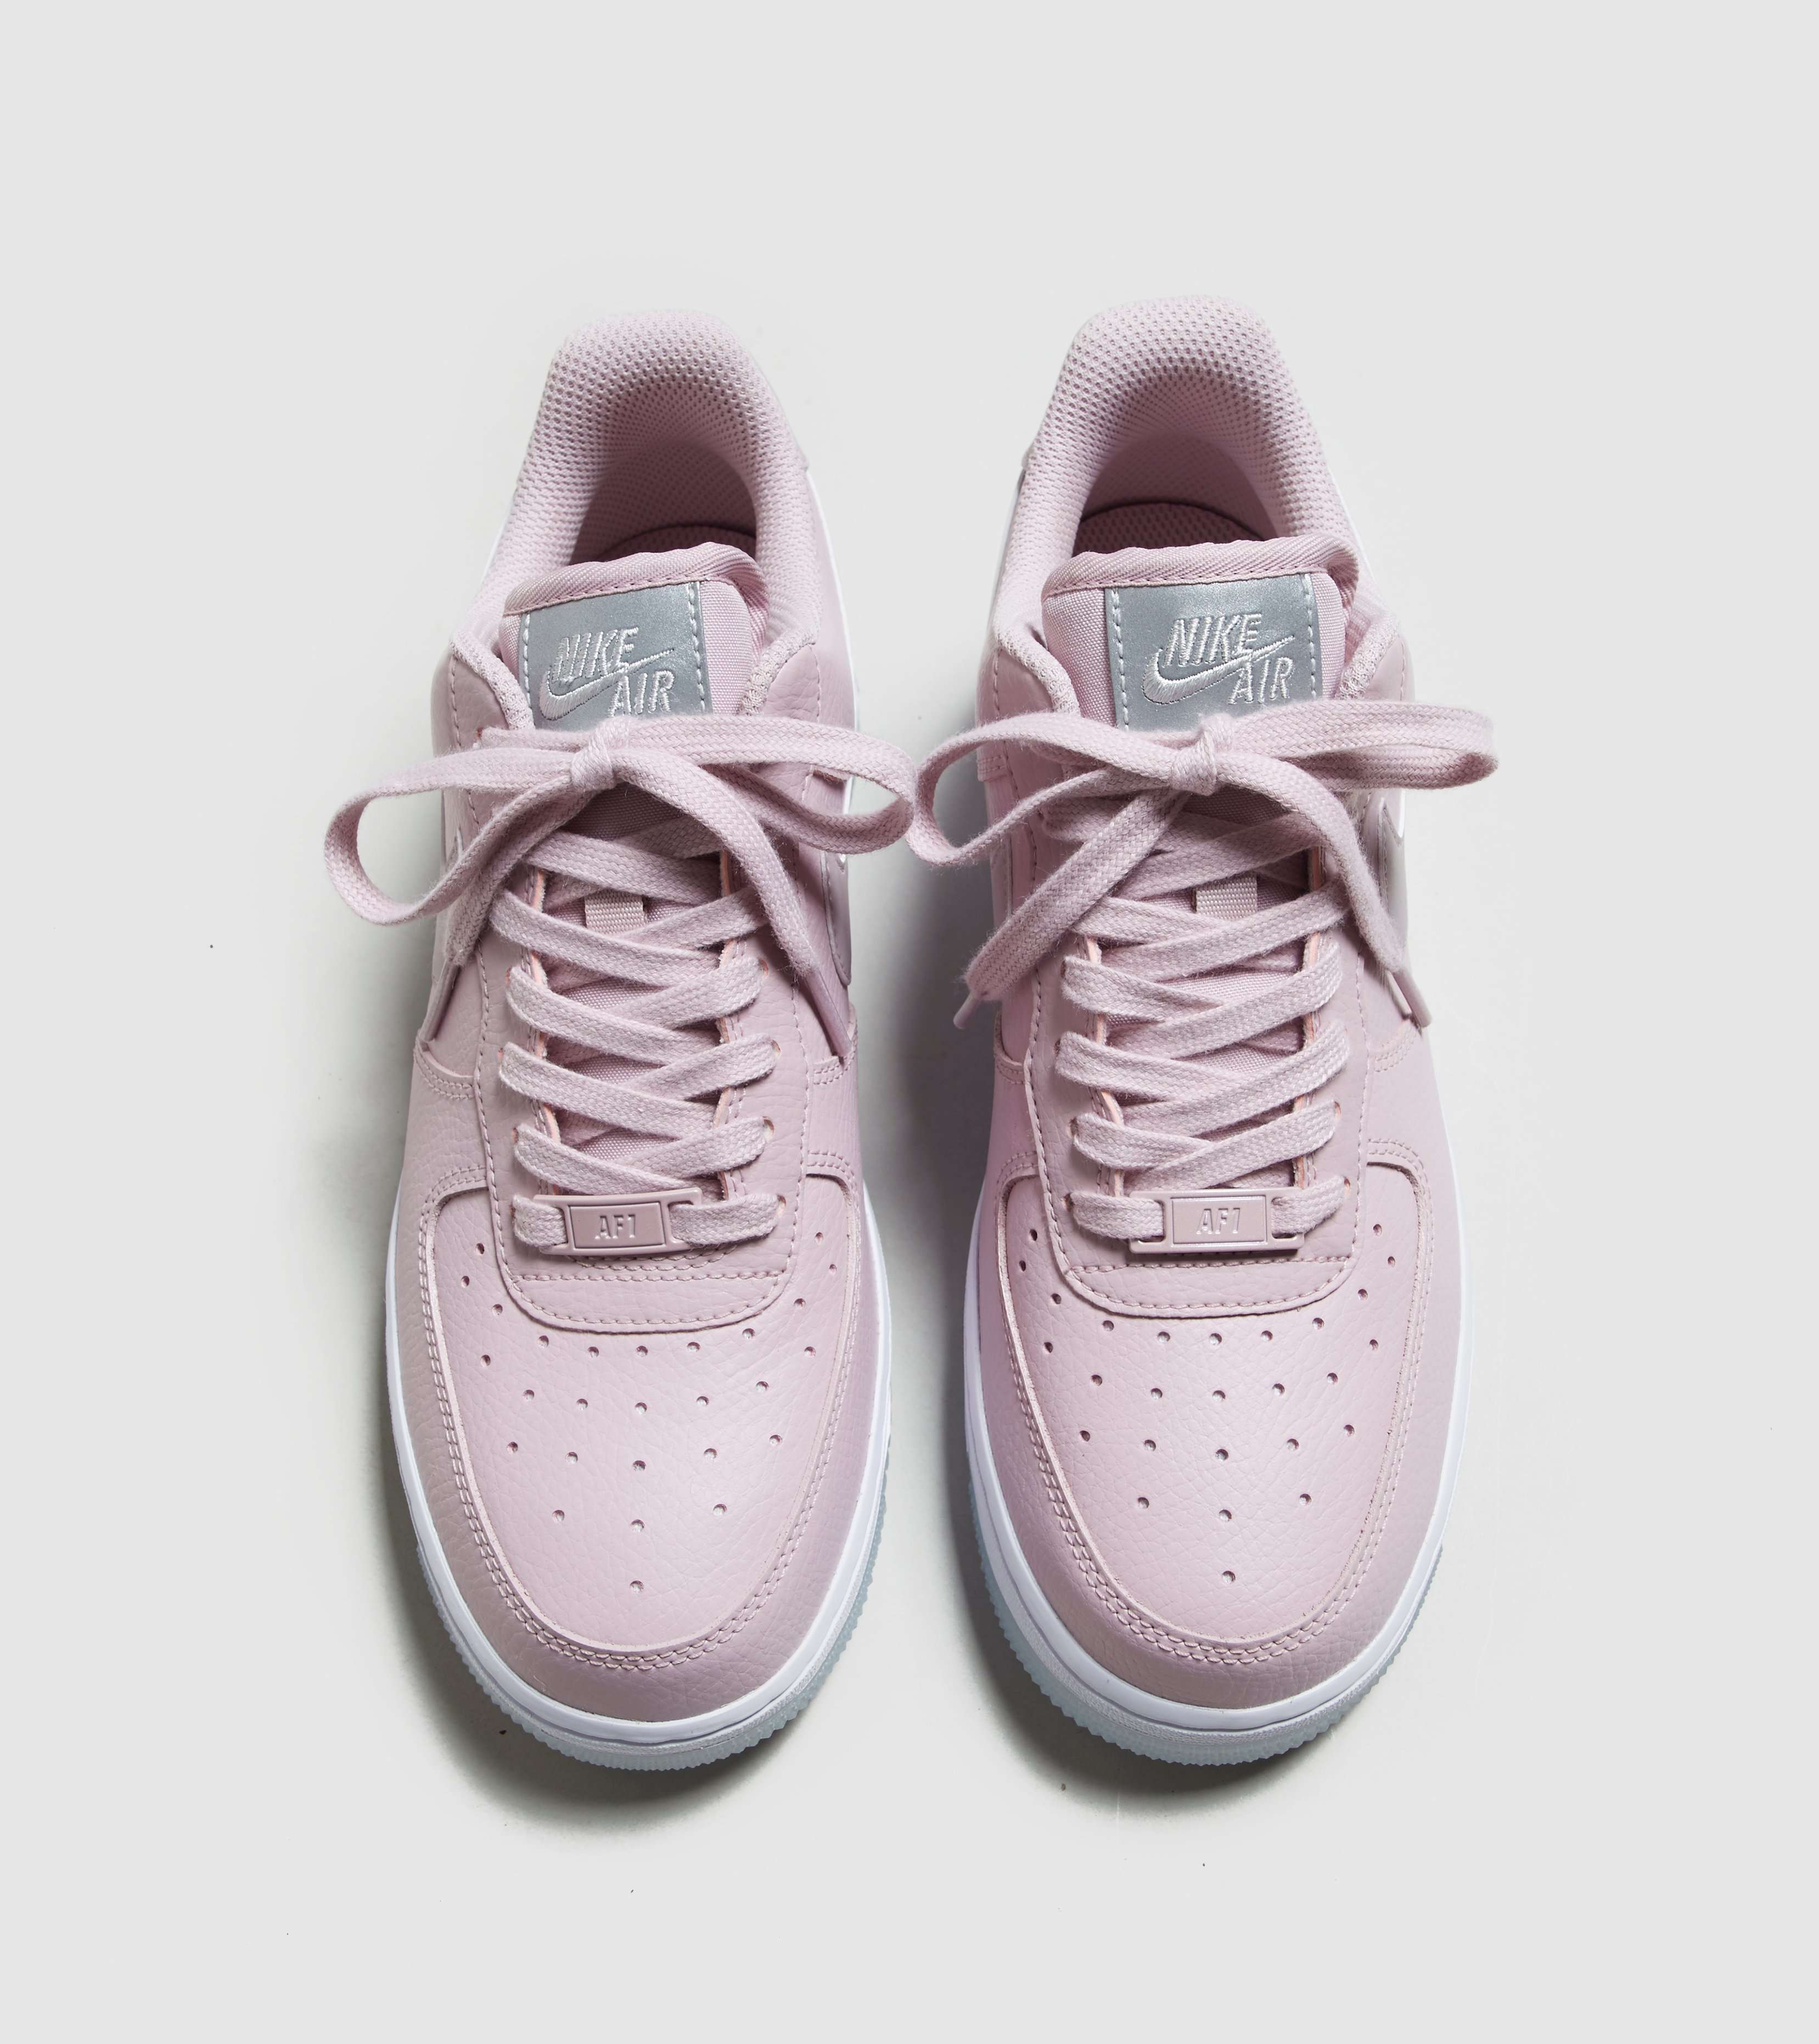 Nike Air Force 1 Lo Women's